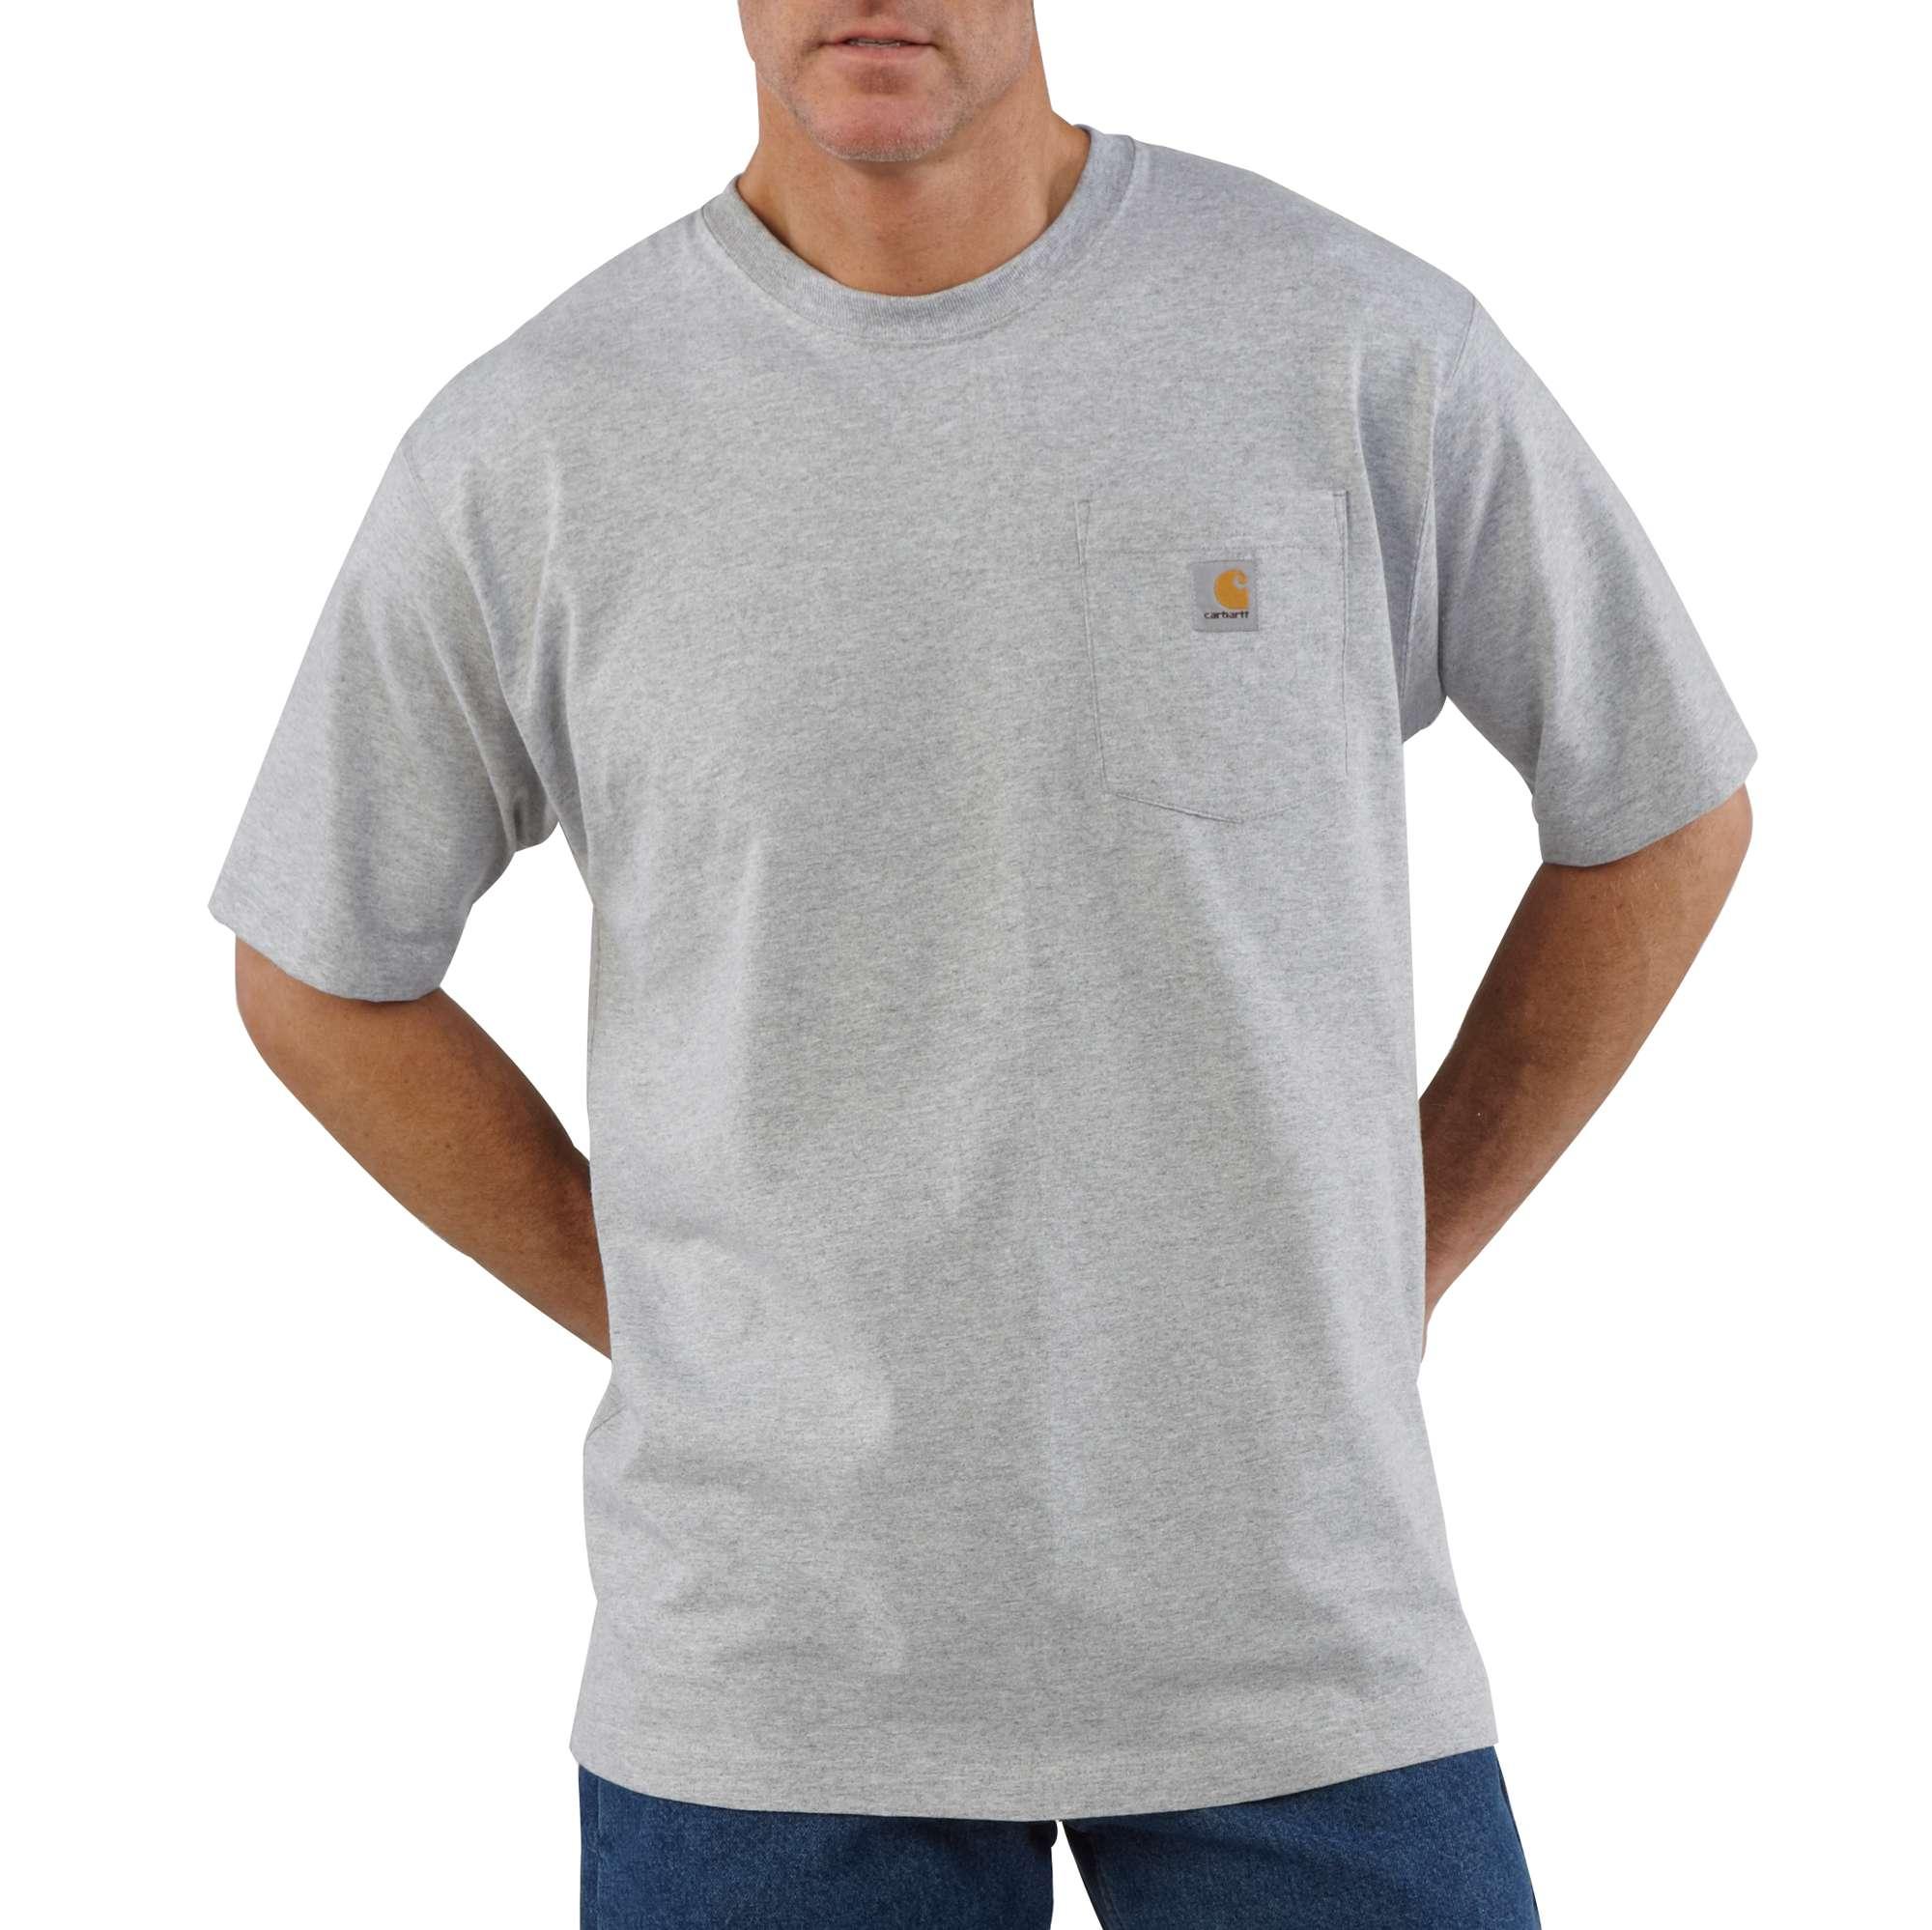 Men's Big & Tall Workwear Pocket T-shirt, Dark Gray,Pewter,Slate, swatch